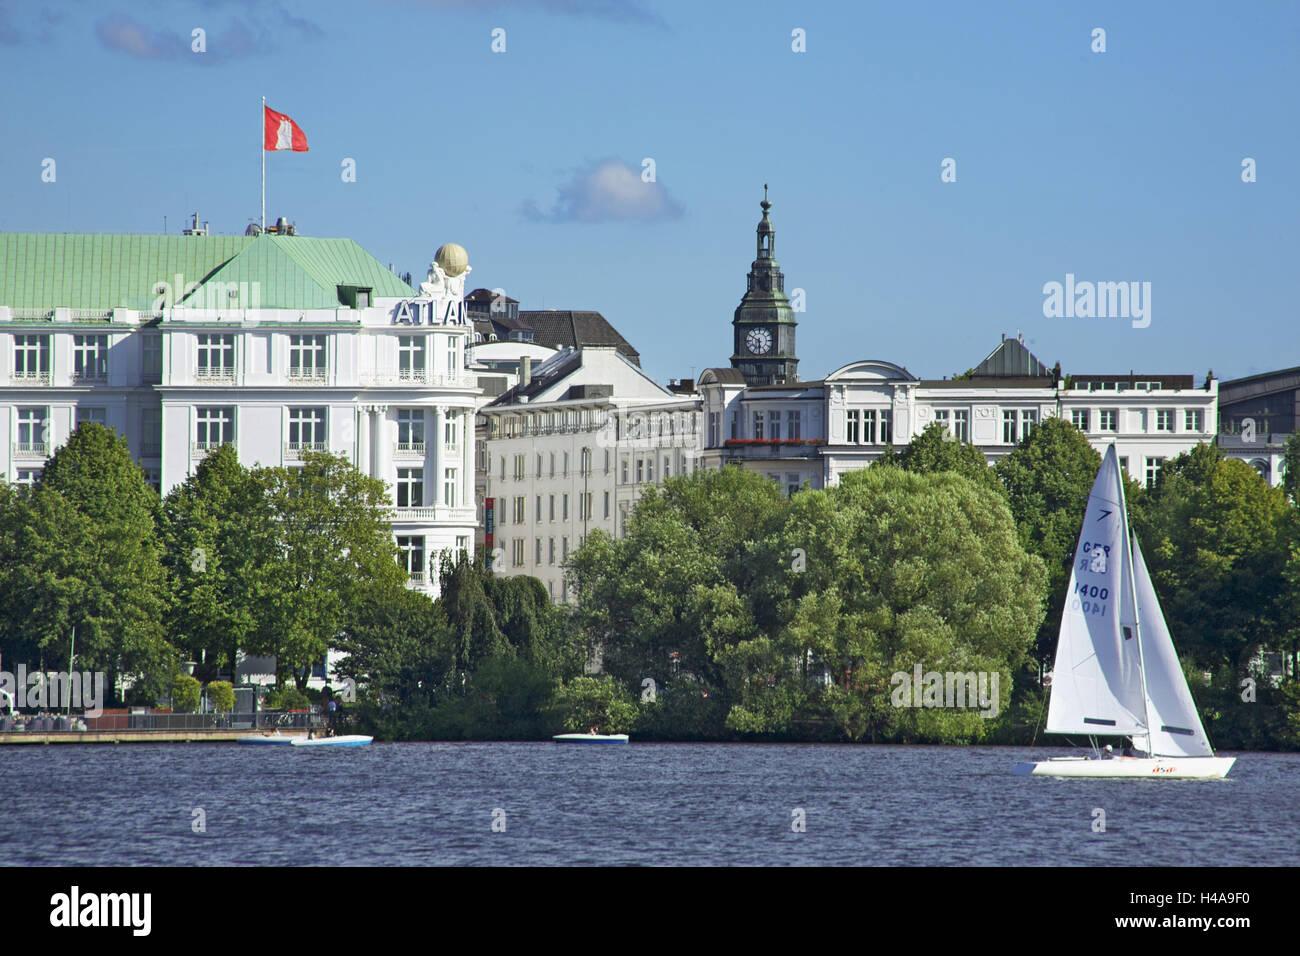 Atlantic Hotel Hamburg Germany